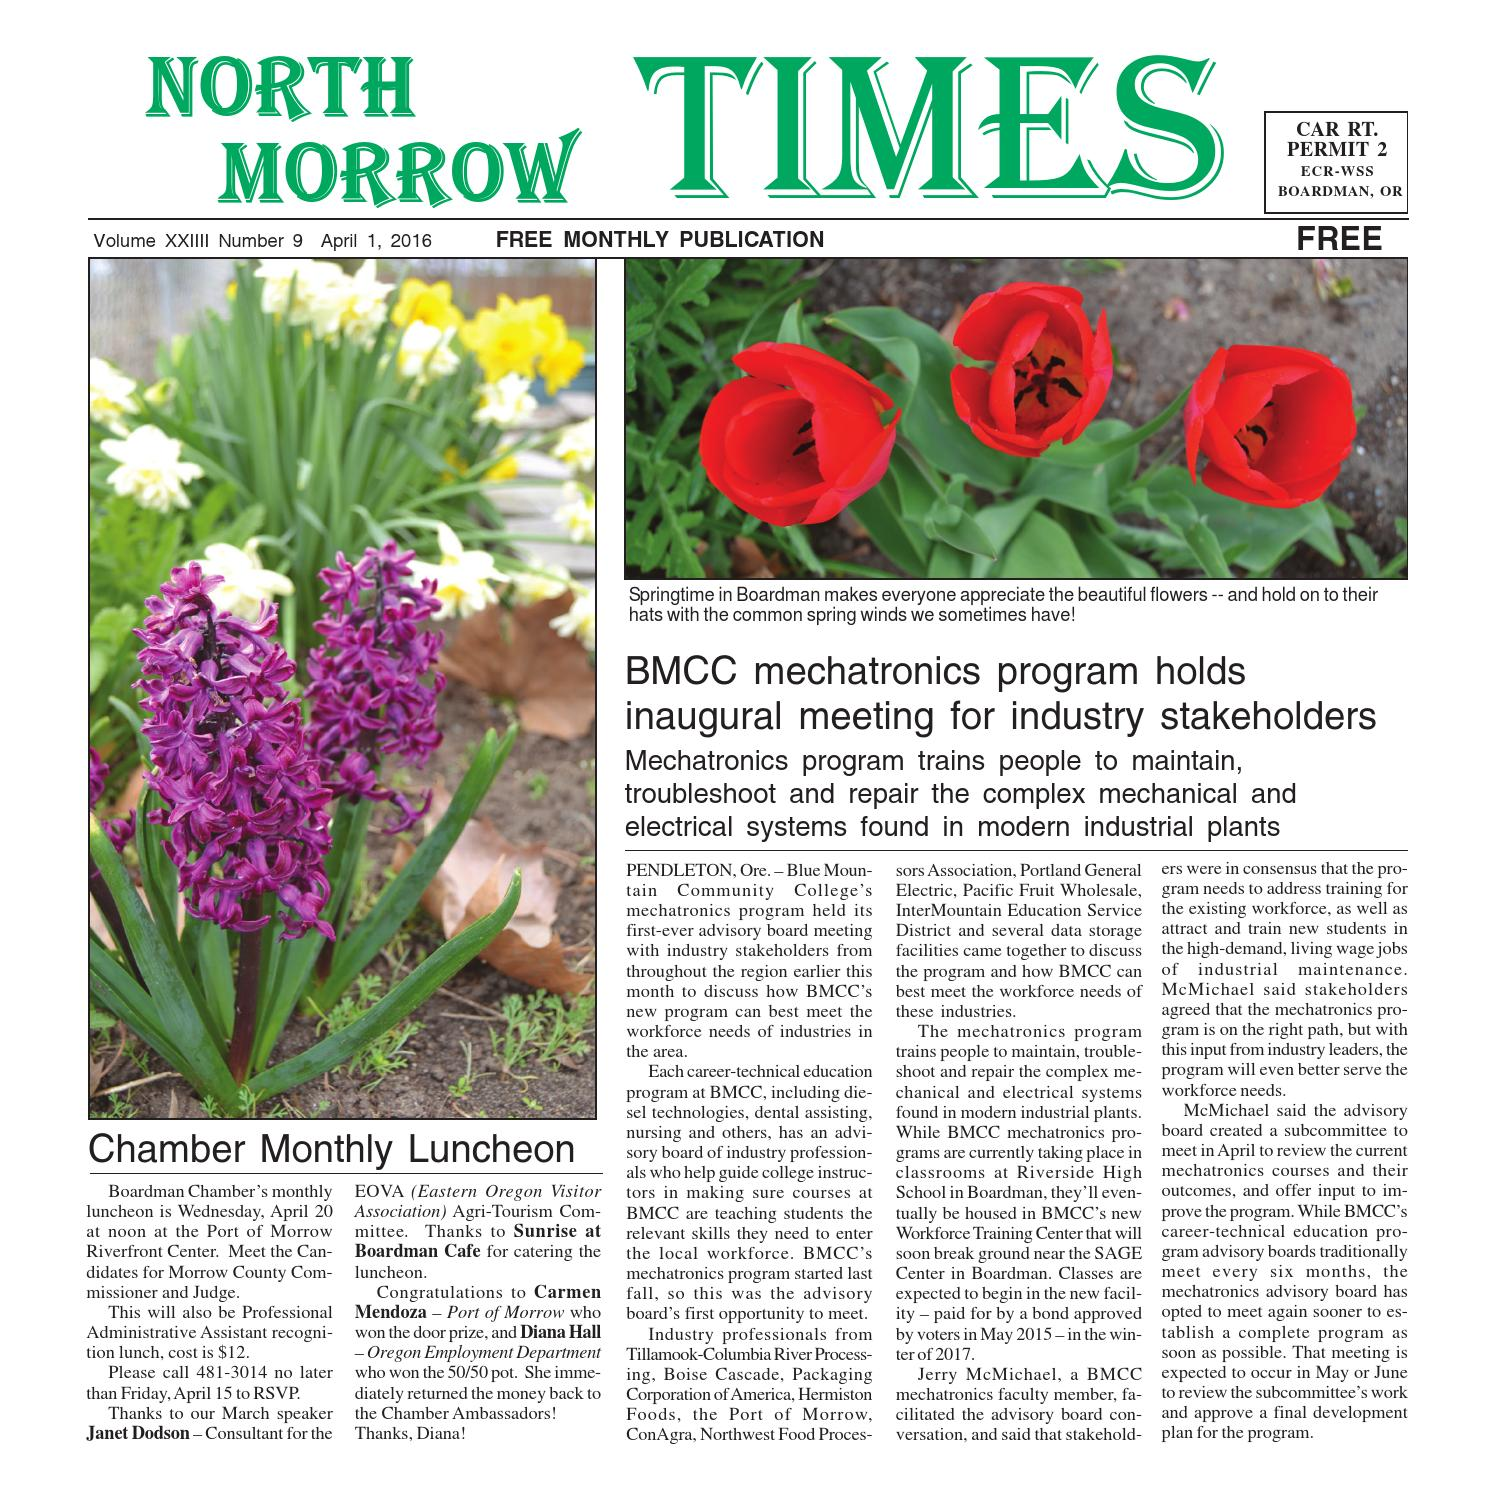 North Morrow Times April 2016 by North Morrow Times - issuu db8a726073c0